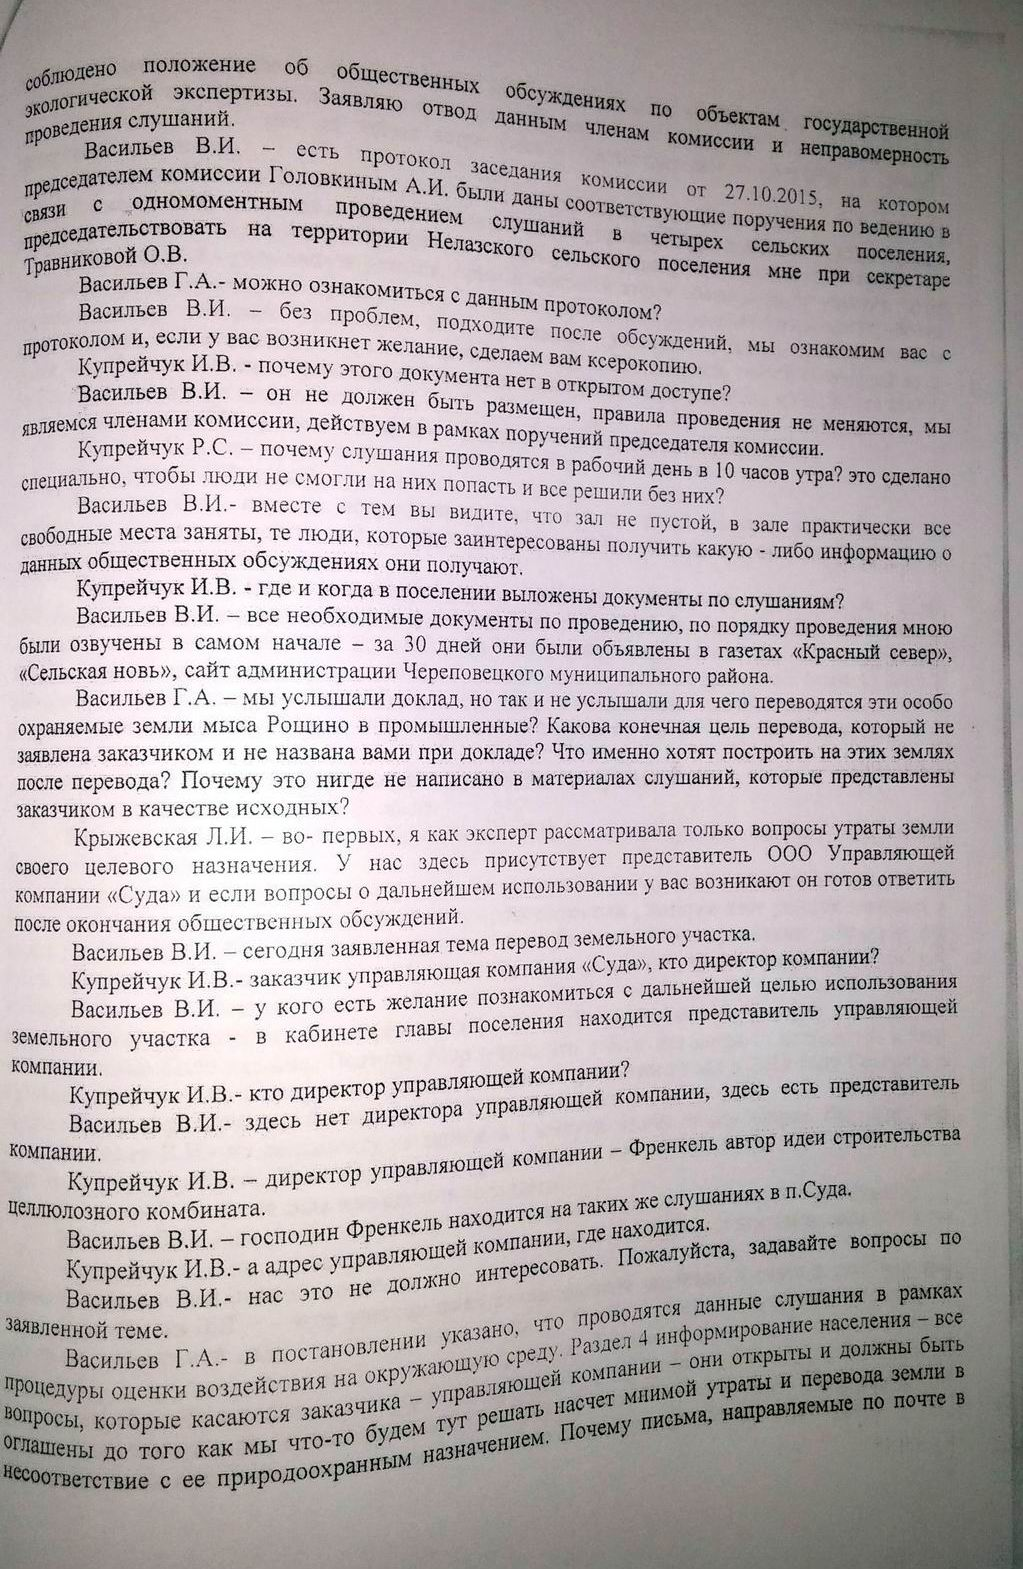 20151223_141958-Шулма